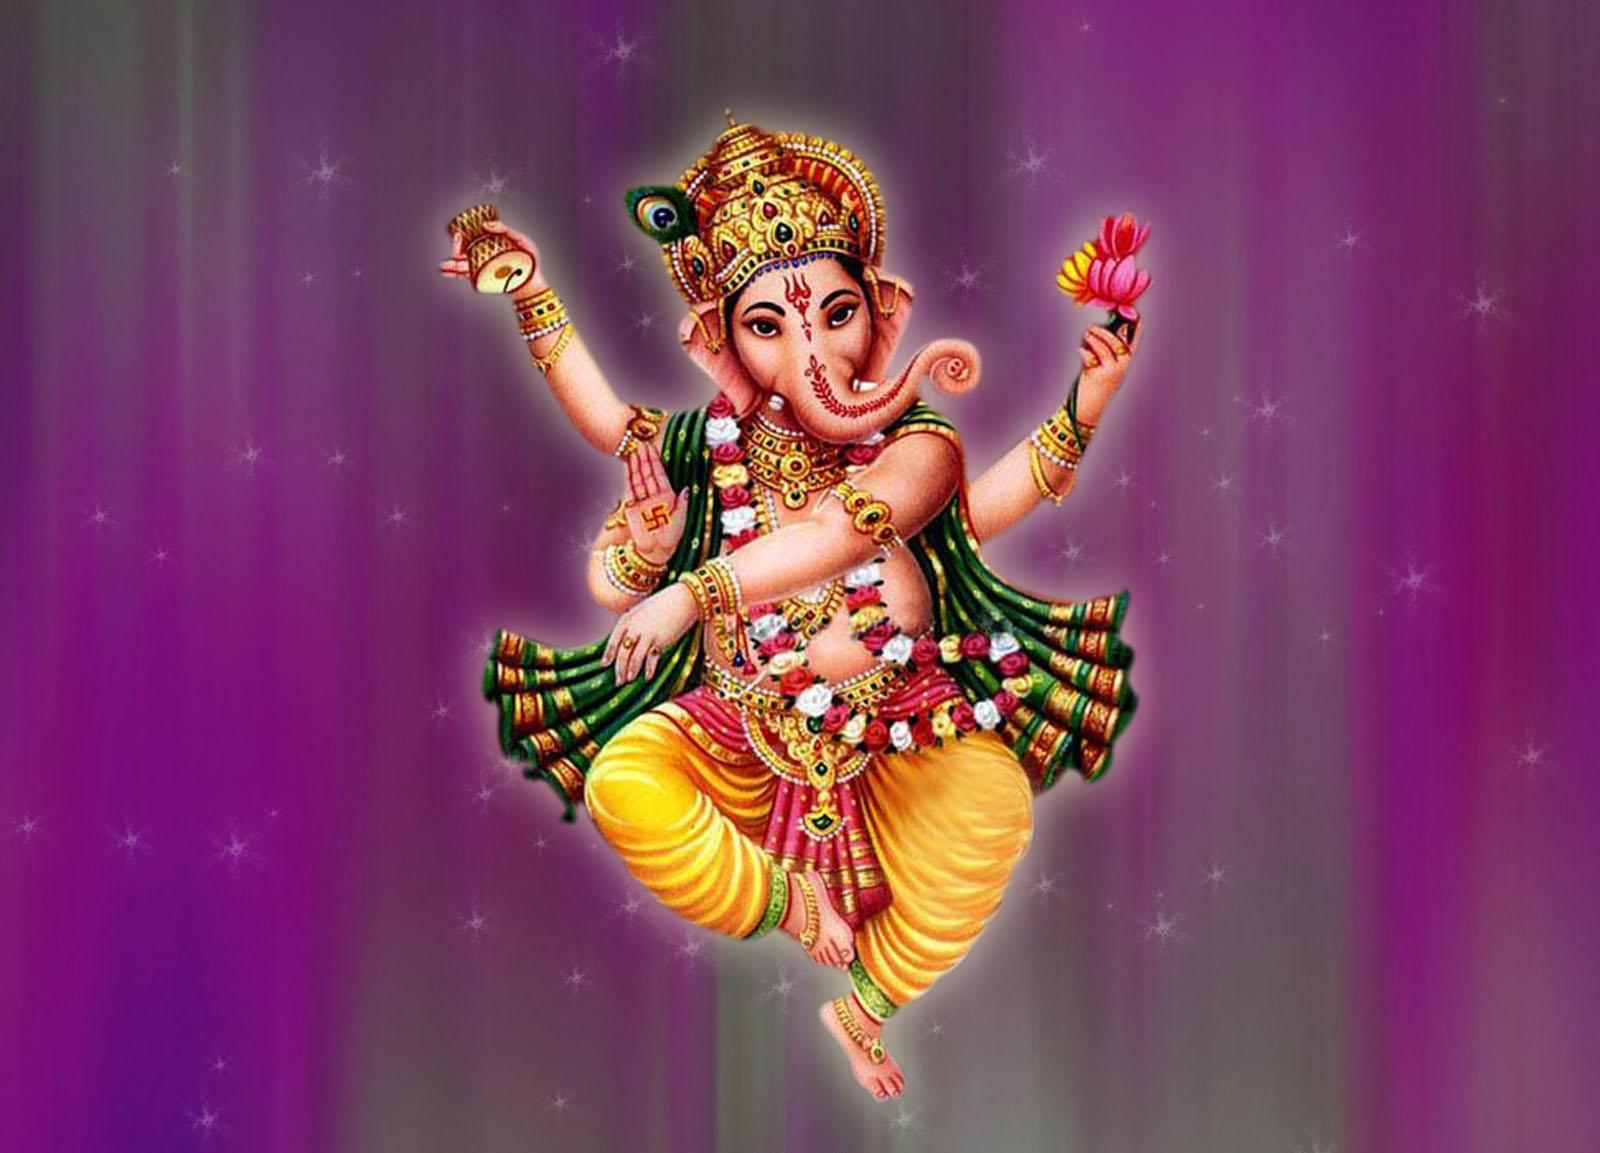 Wallpaper download ganesh - Beautiful Lord Ganesha Hd Wallpaper